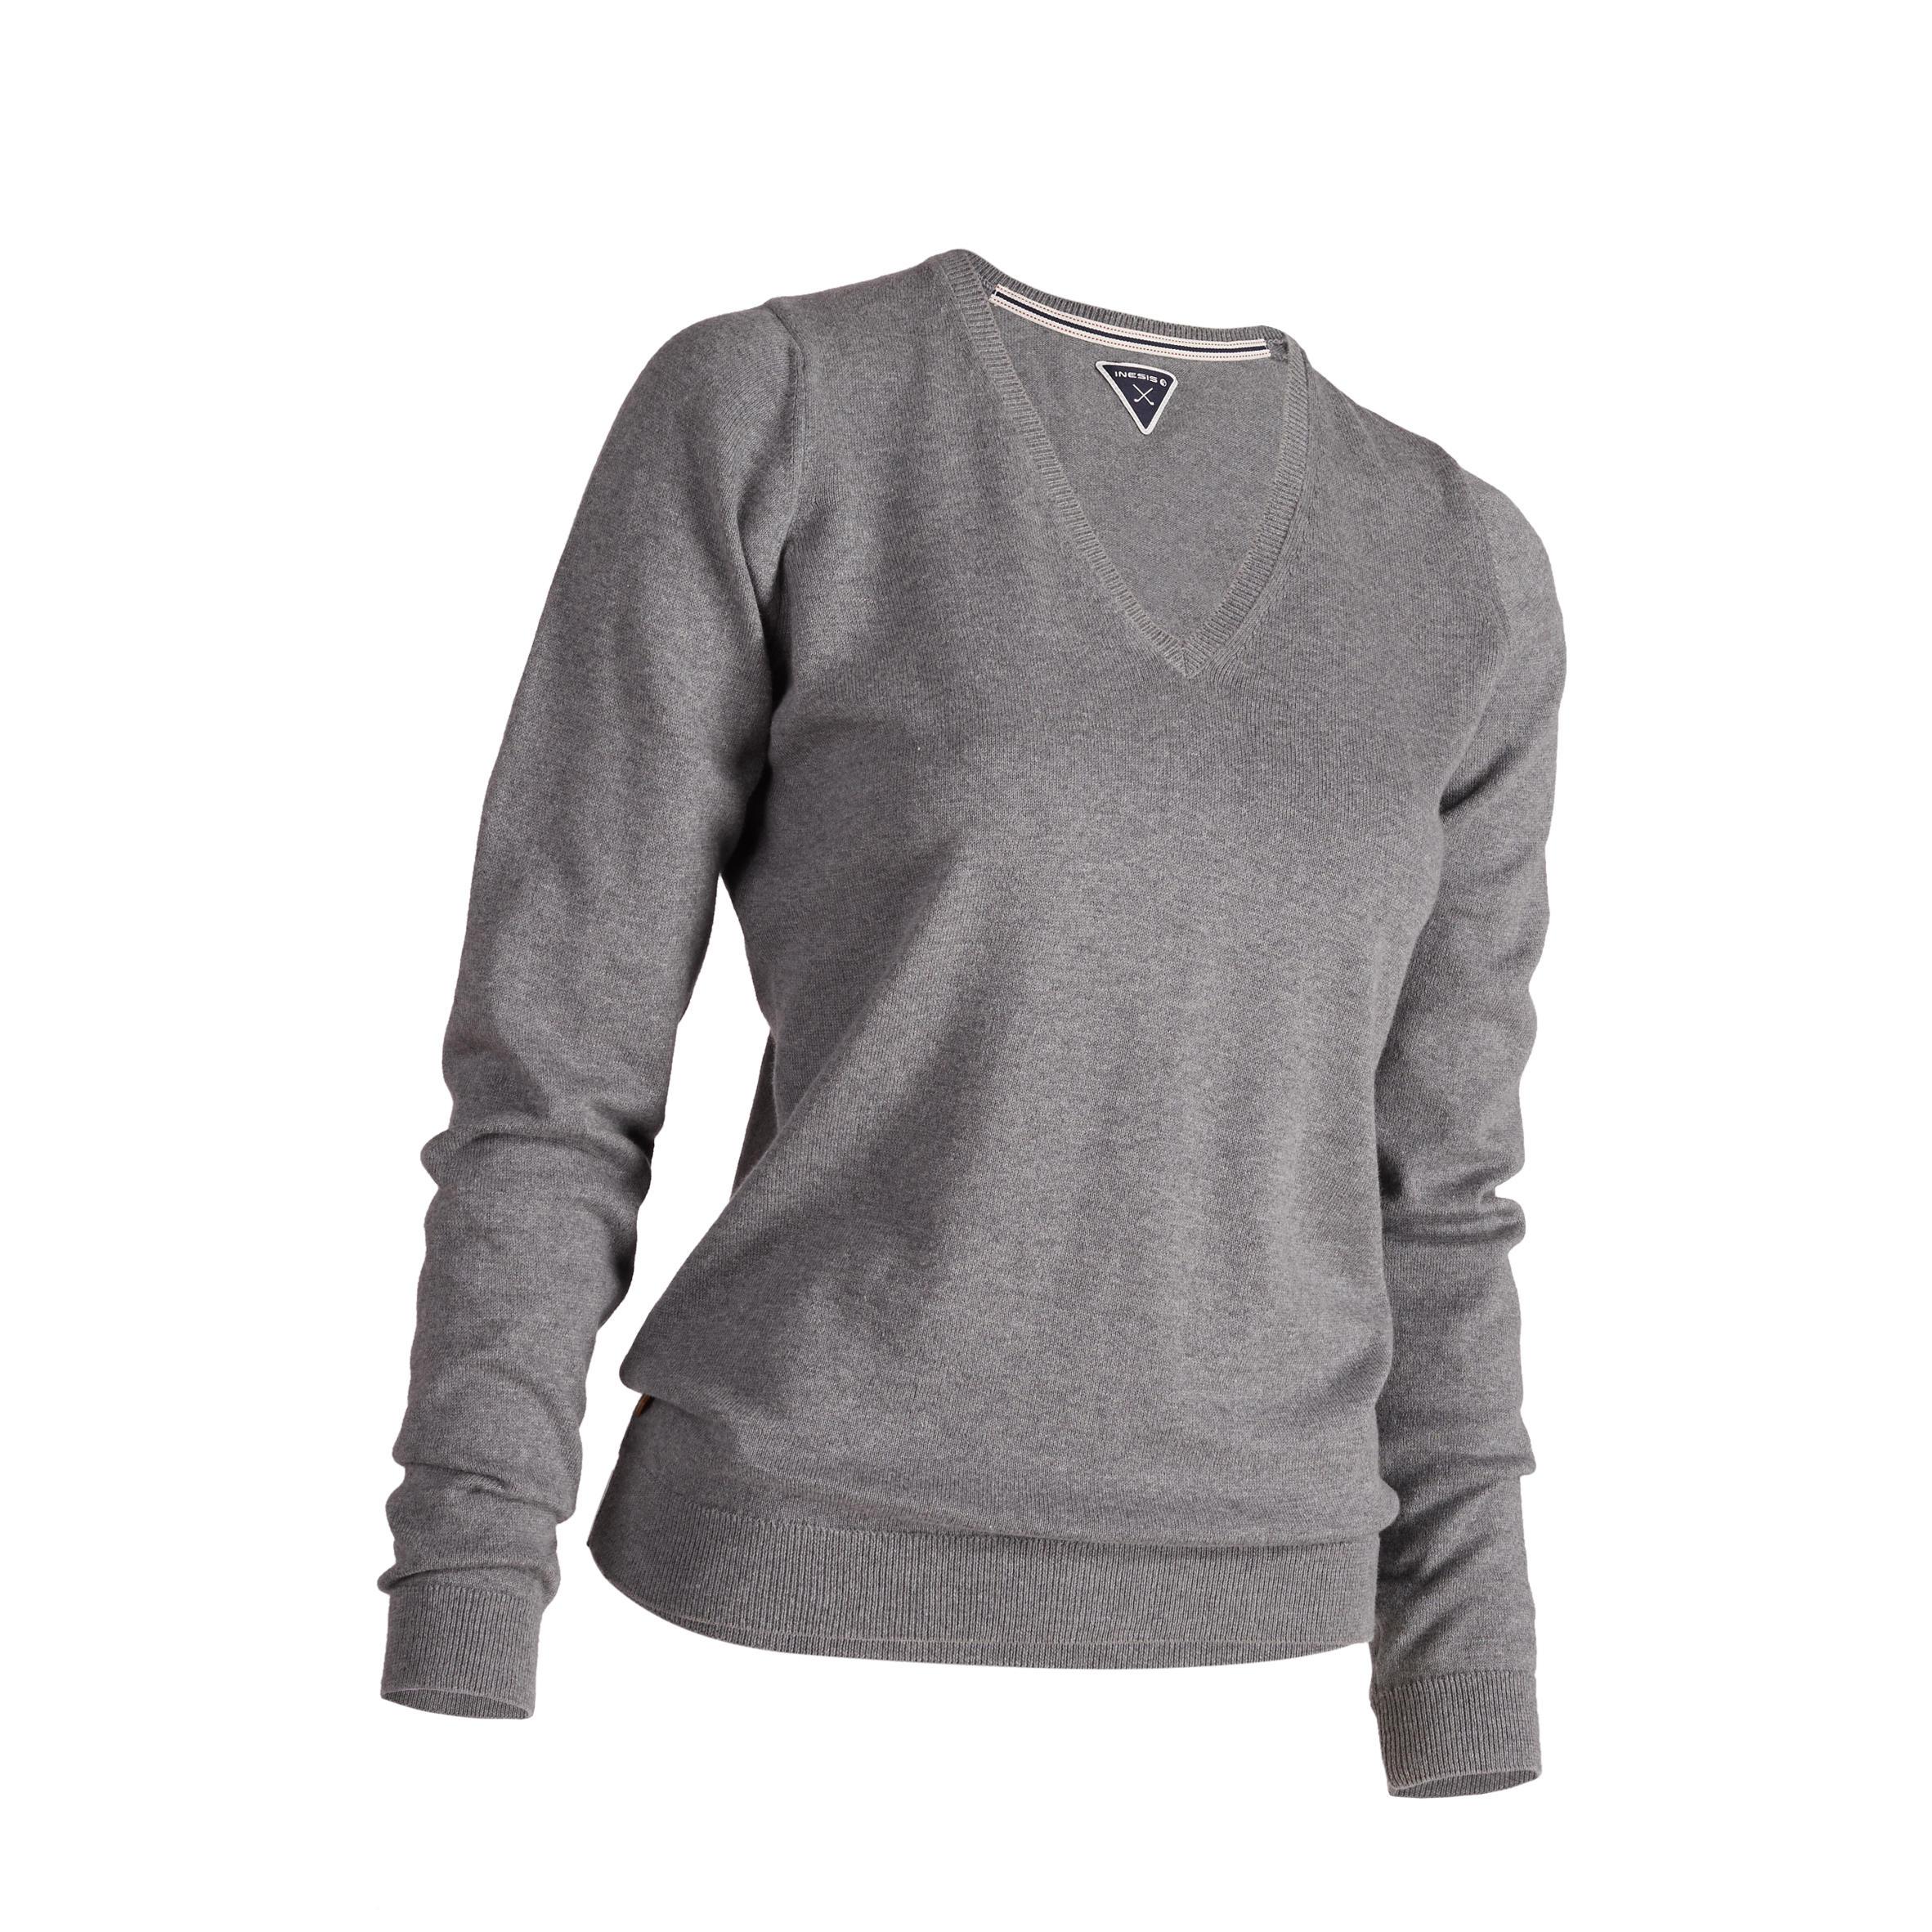 Sweater und Hoodies bei Sportiply b086dc49d1